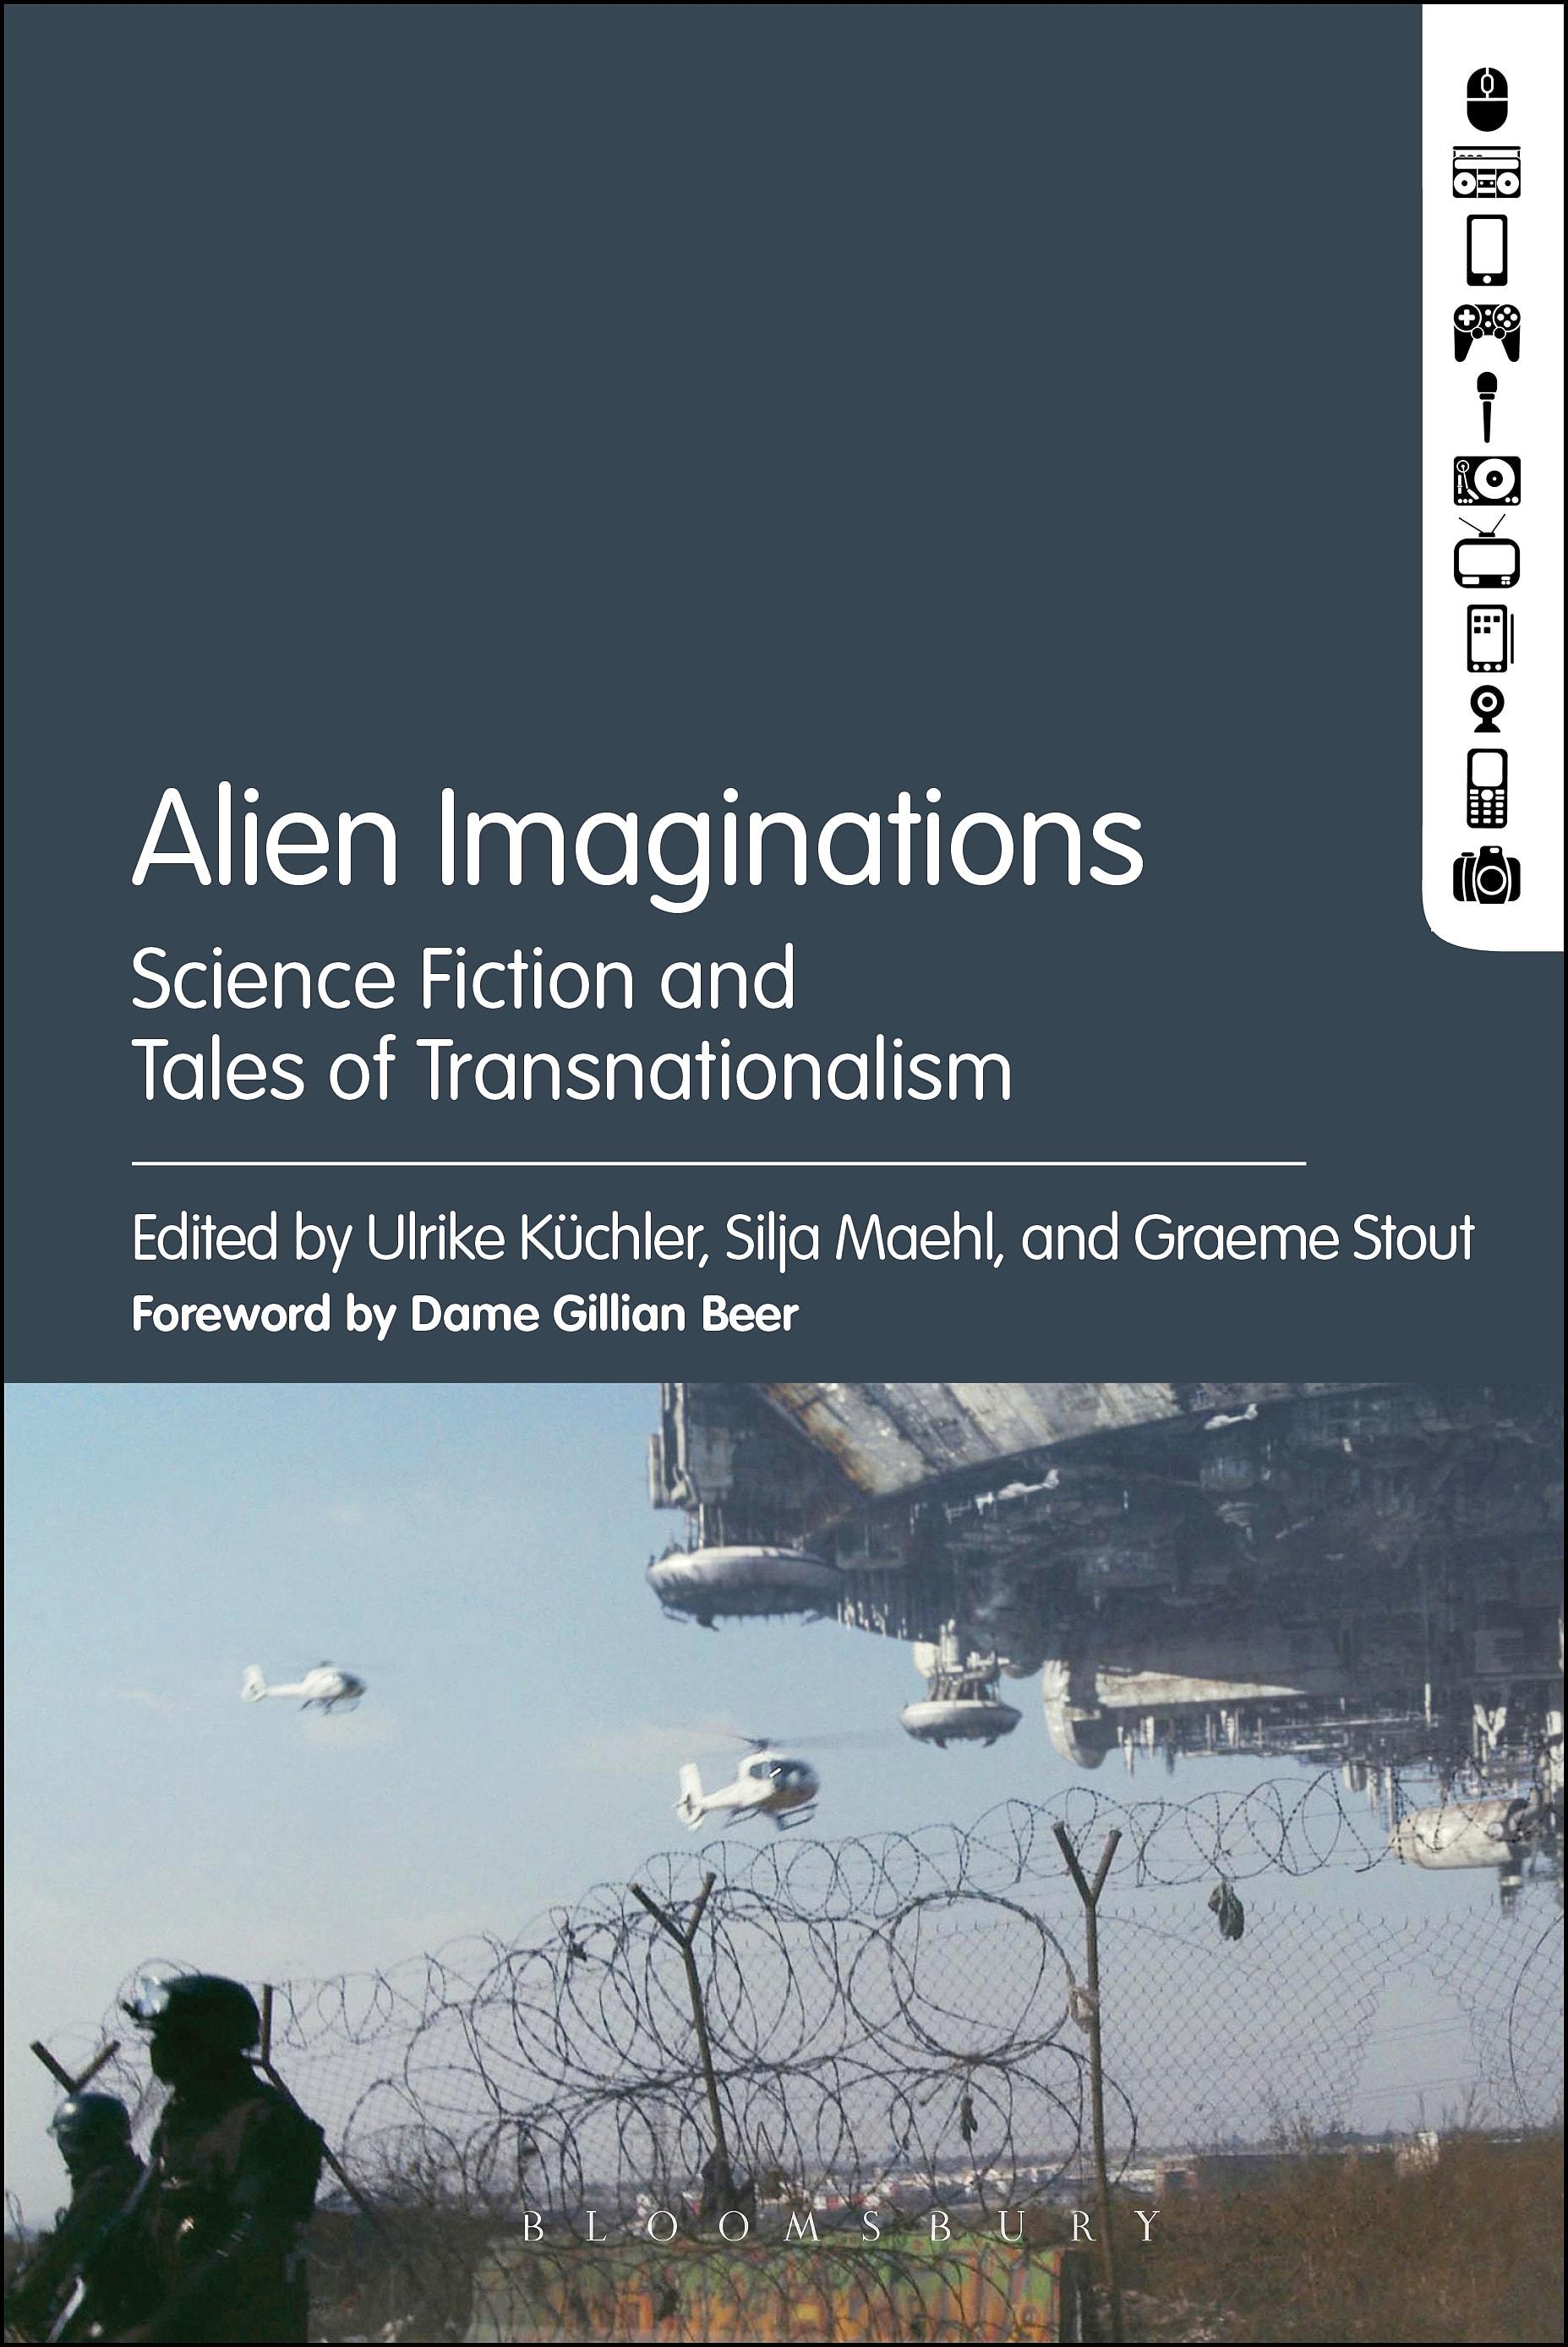 Alien Imaginations